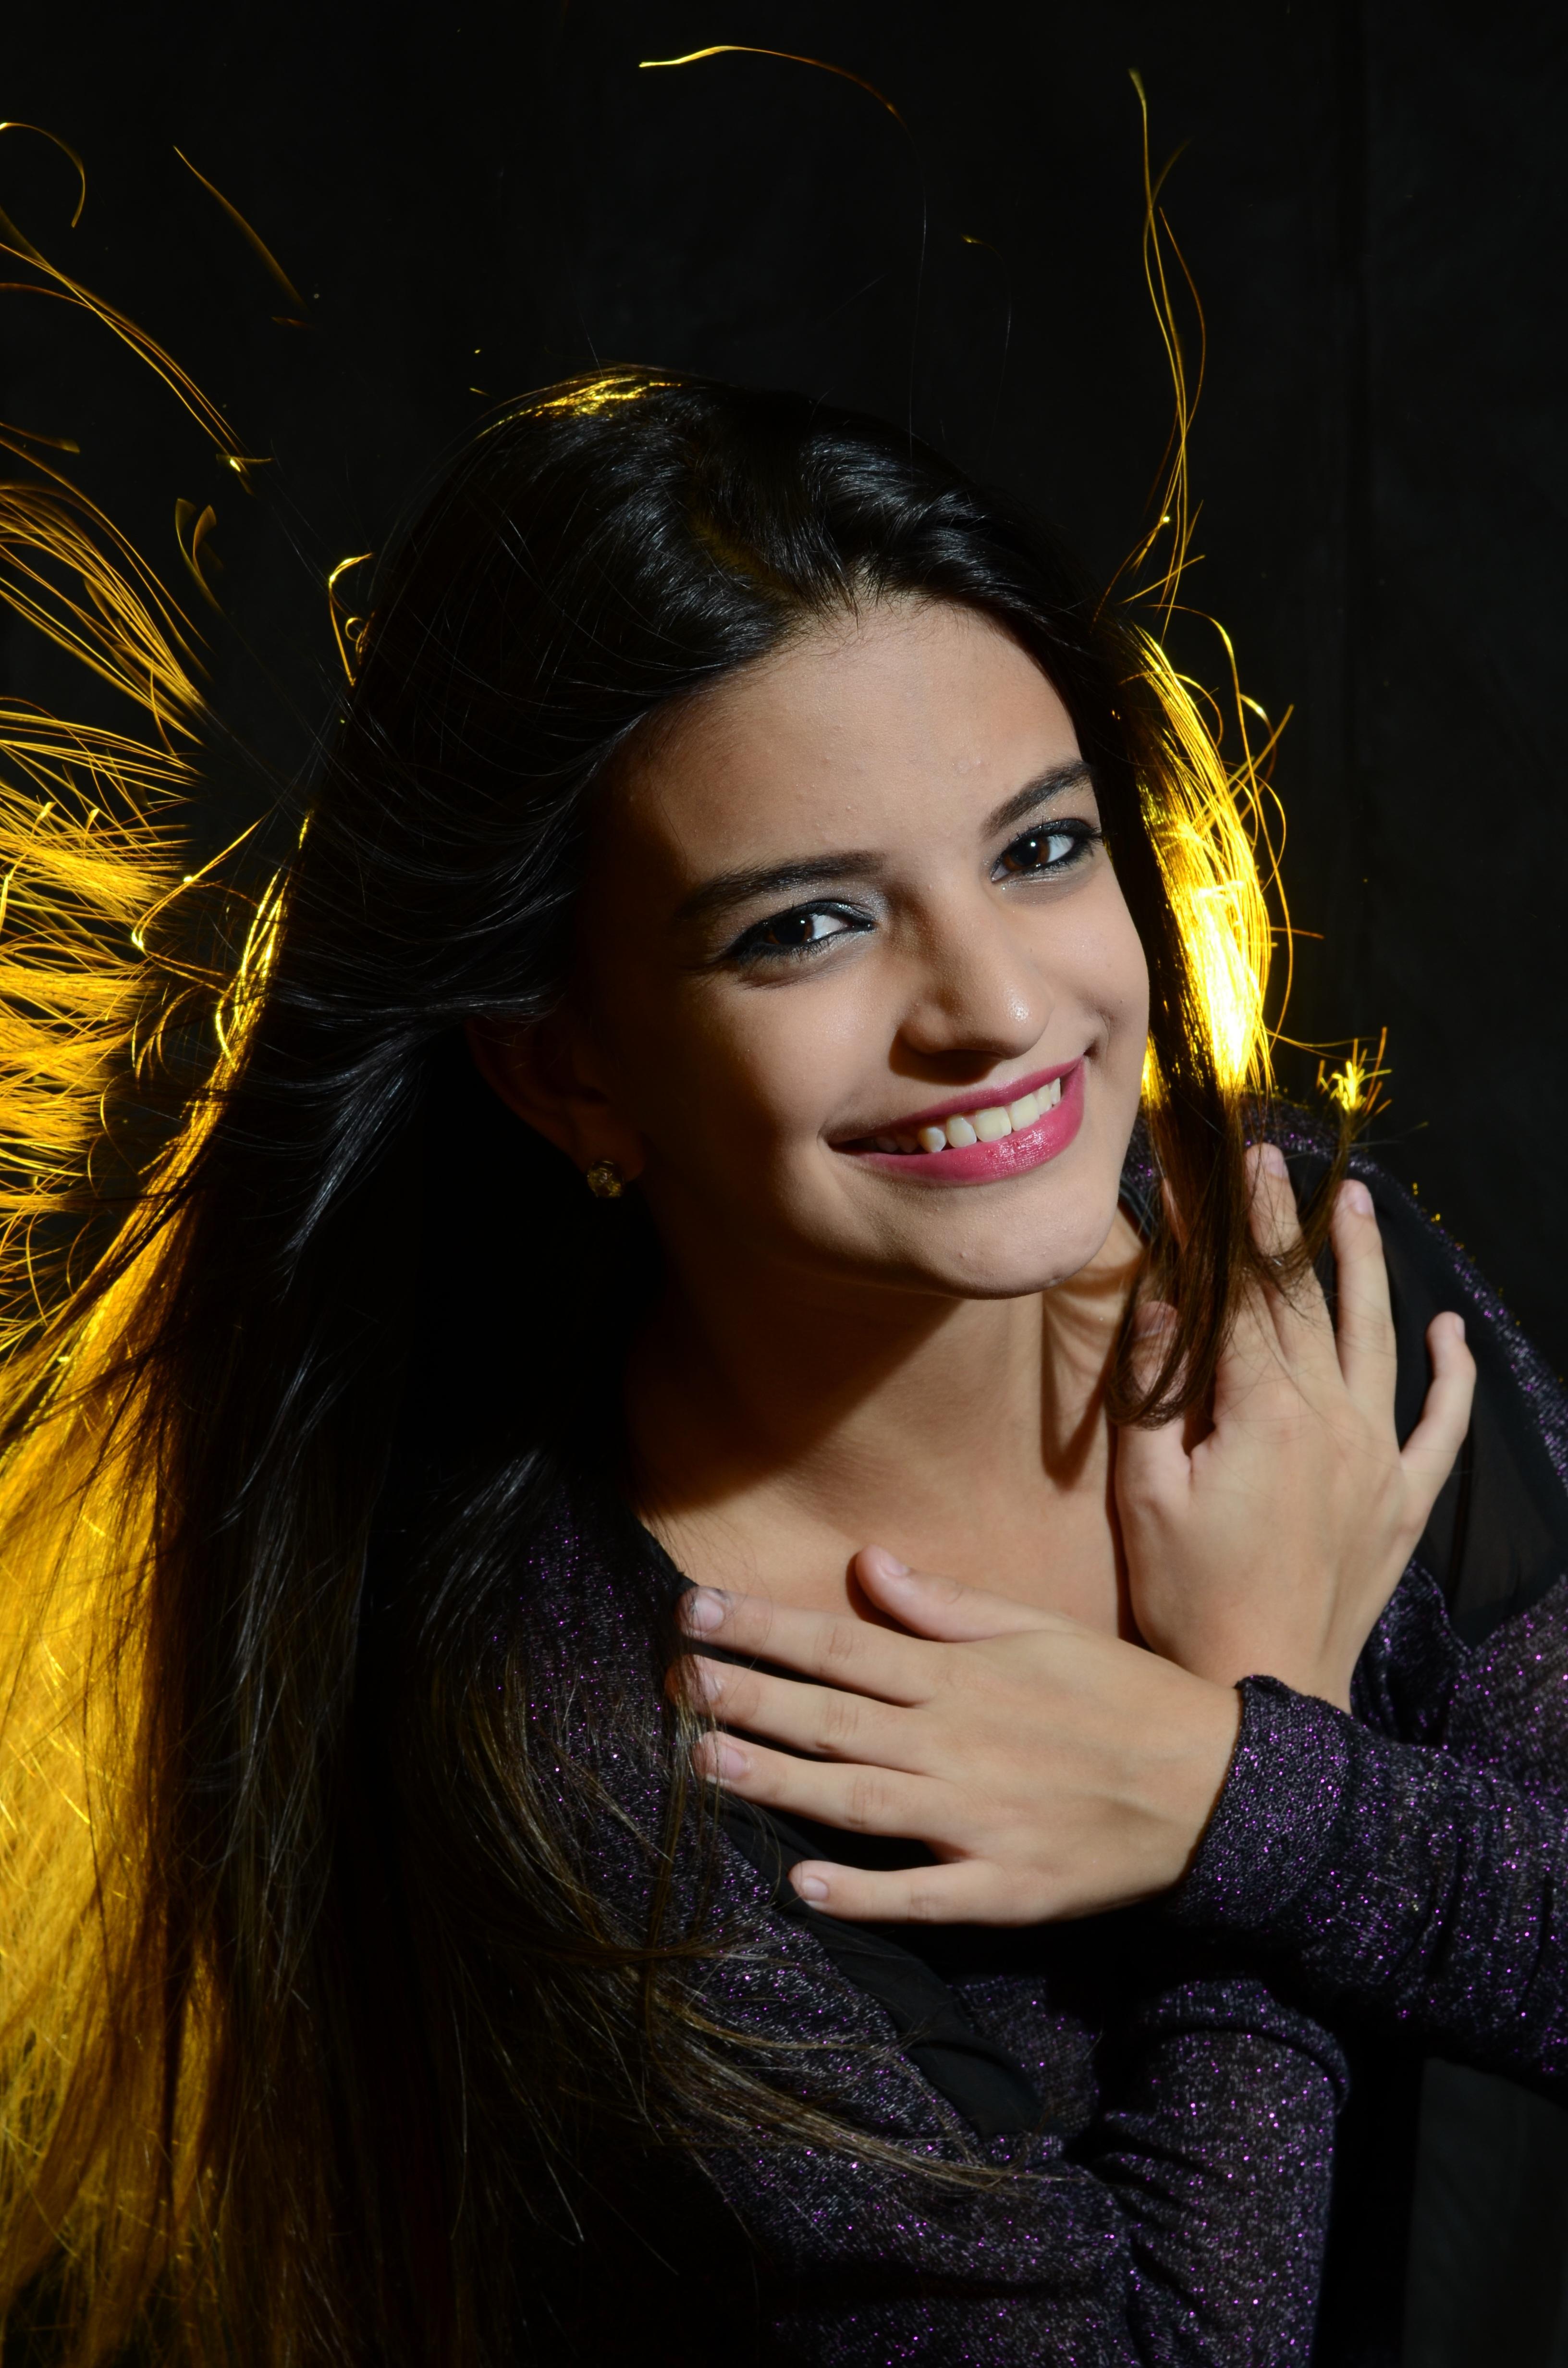 Person Girl Woman Hair Photography Wind Dark Portrait Model Fashion Lady Hairstyle Smile Dress Eye Beauty